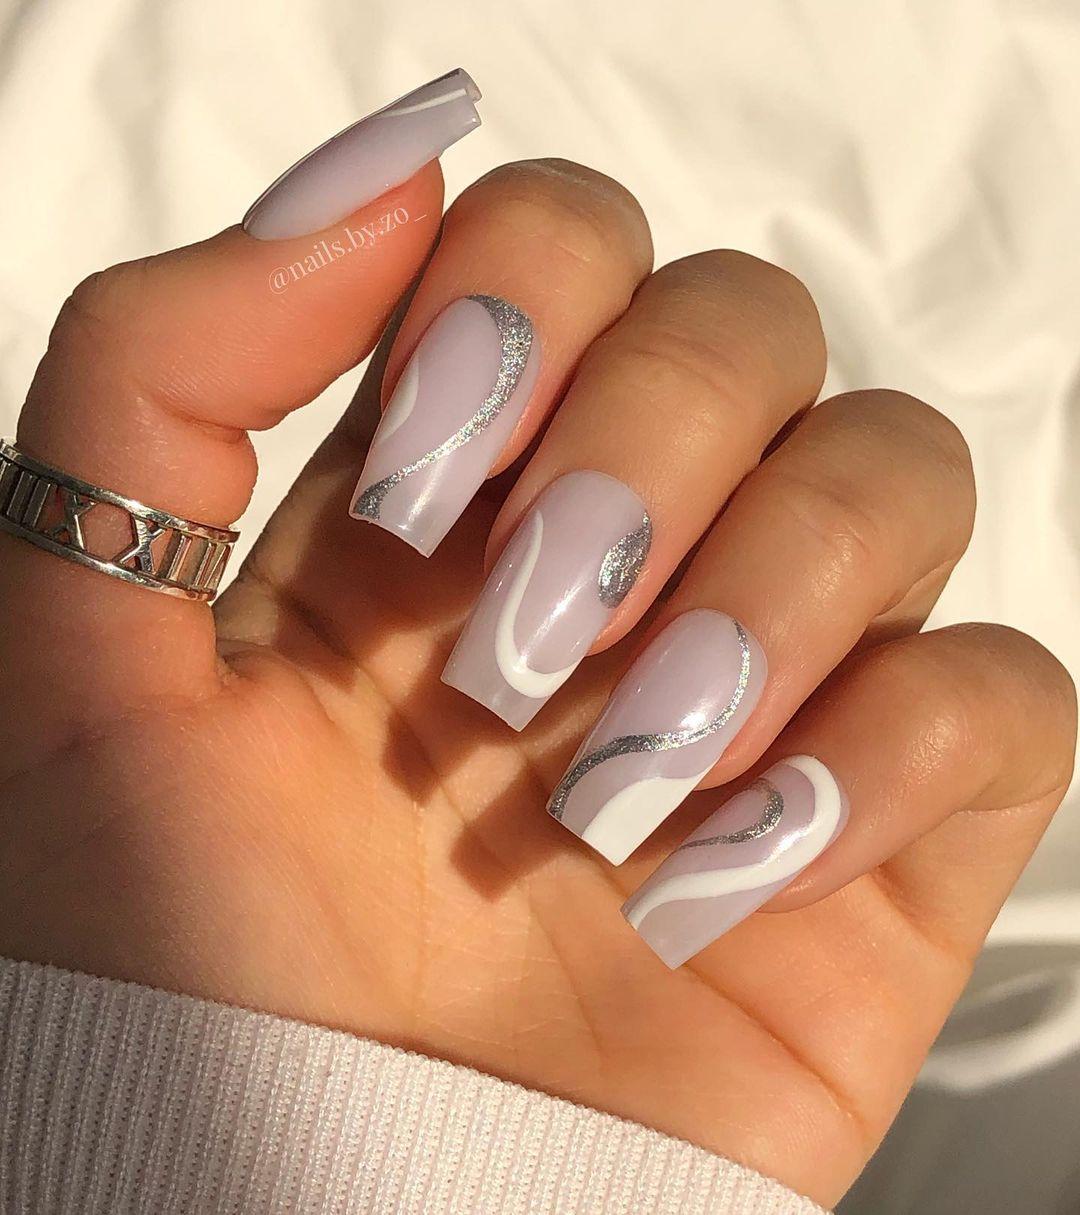 Grey and white wavy nails